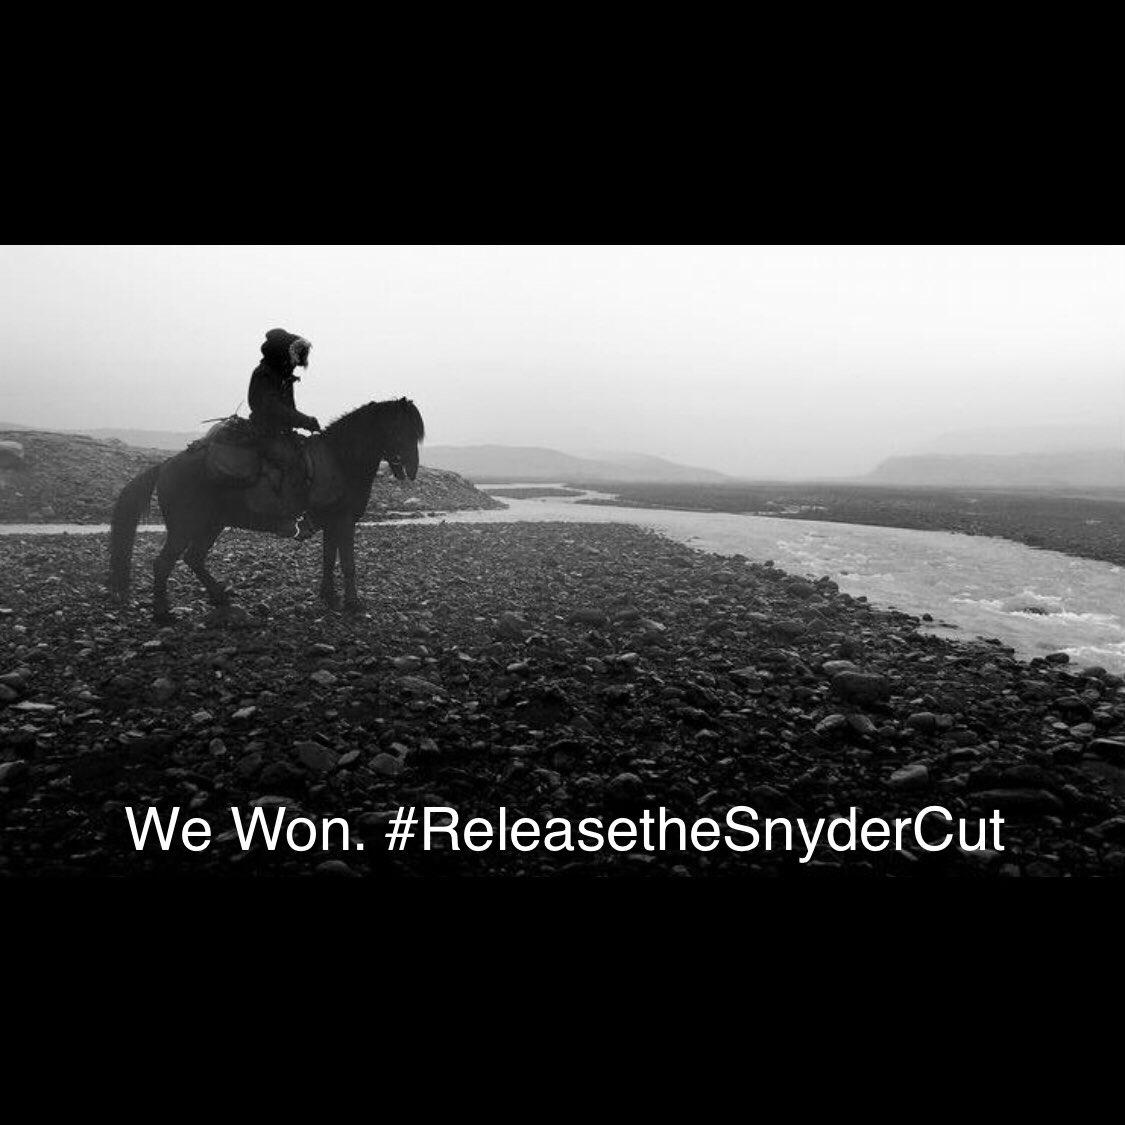 Ganamos! #ReleaseTheSnyderCut https://t.co/eApGbWGxTD